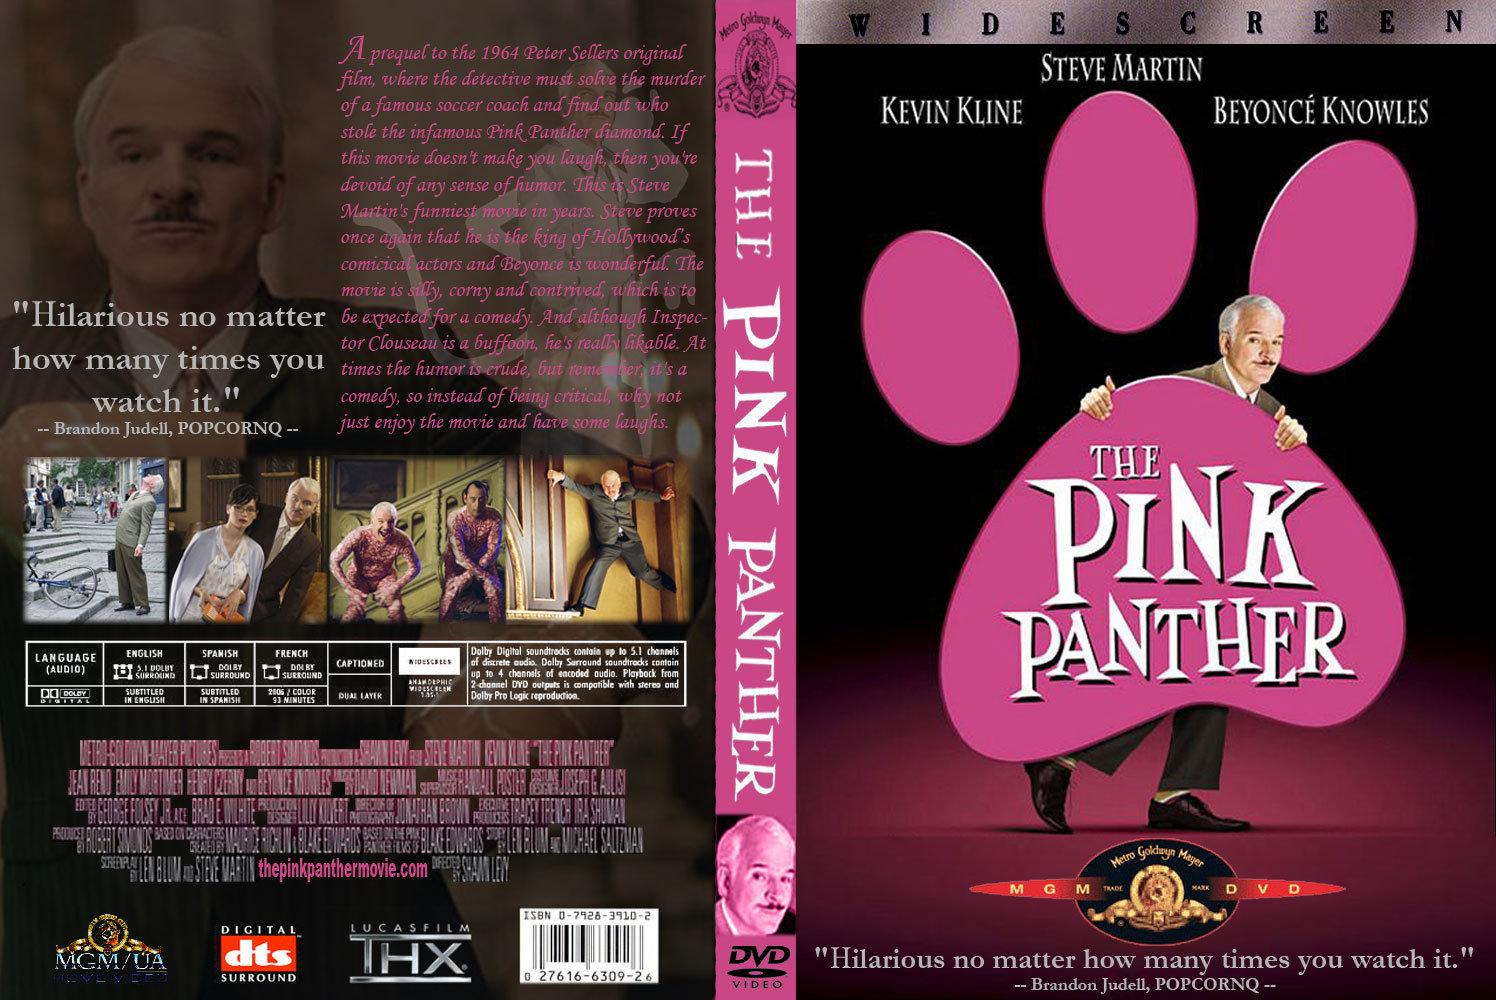 http://3.bp.blogspot.com/_26kdUINH1eY/TTmA4lmf_0I/AAAAAAAAAj8/OdS8f9q-2U8/s1600/The_Pink_Panther_2005_custom-%255Bcdcovers_cc%255D-front.jpg